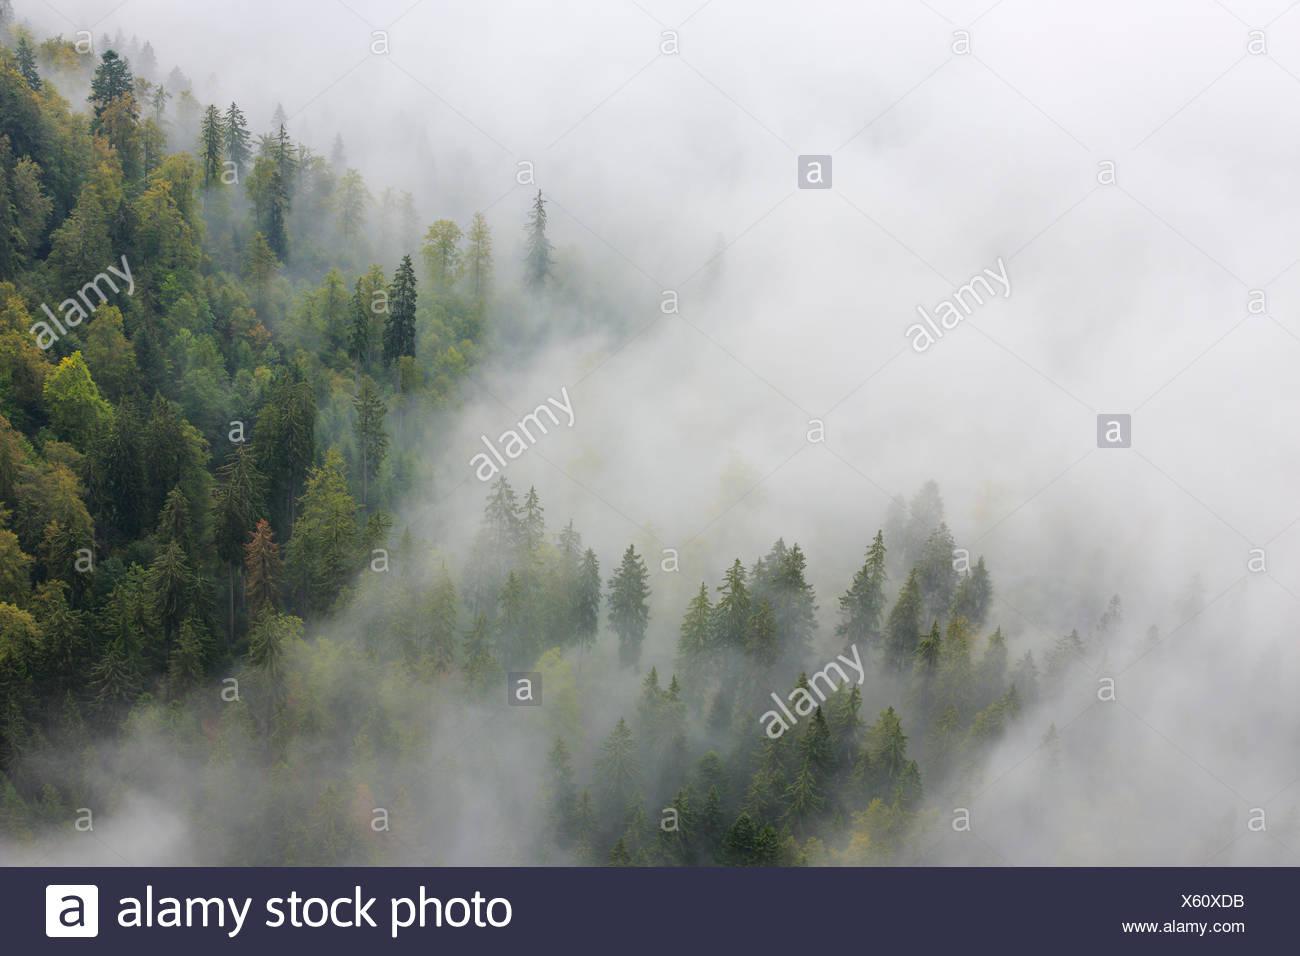 Tree, trees, spruce, spruces, spruce forest, Jura, nature, fog, fog patches, canton Neuenburg, Neuenburg Jura, plant, Switzerland - Stock Image